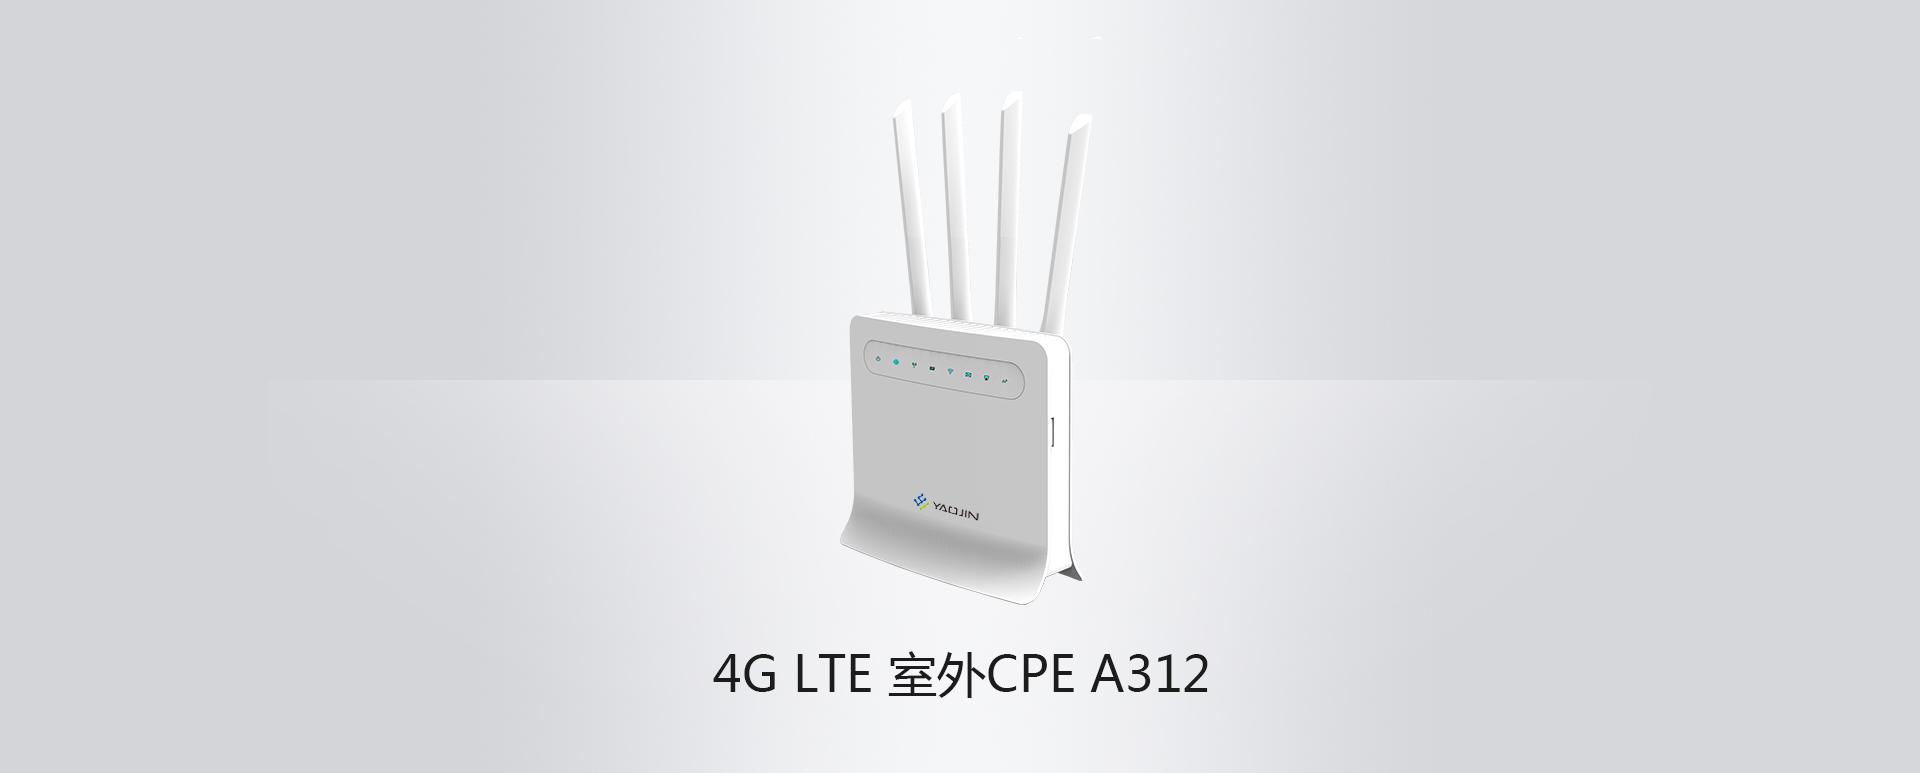 4G LTE 室外CPE A312